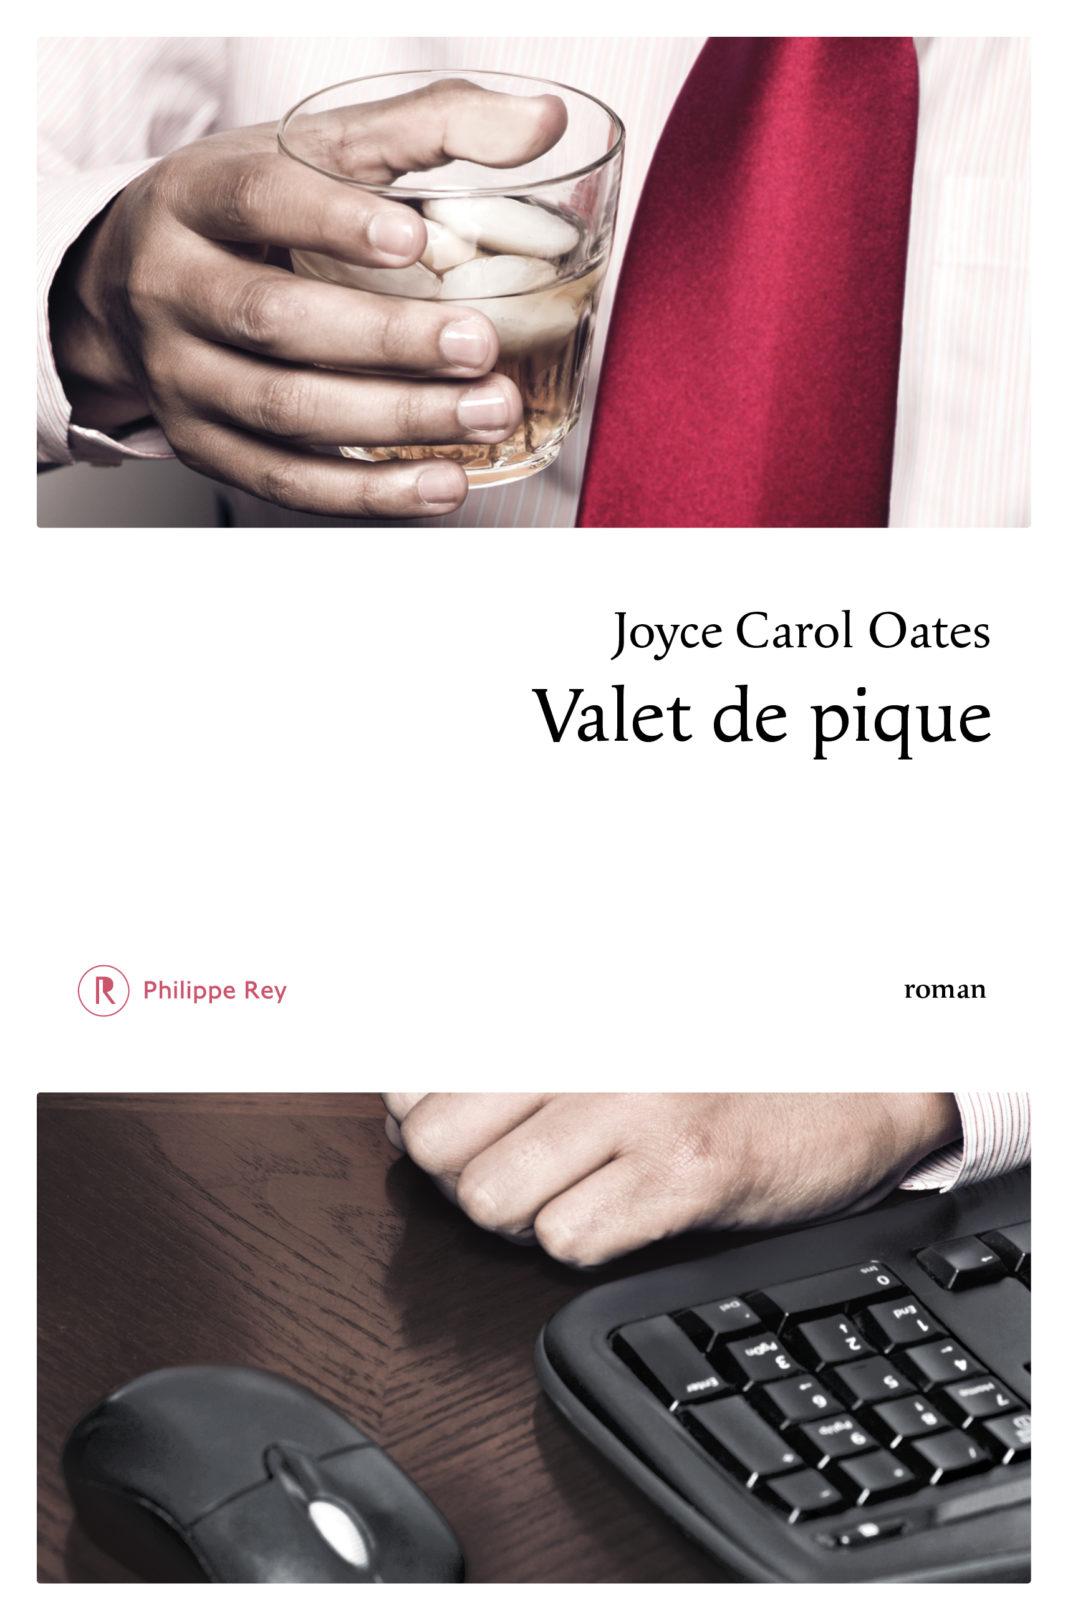 VALET DE PIQUE JOYCE CAROL OATES